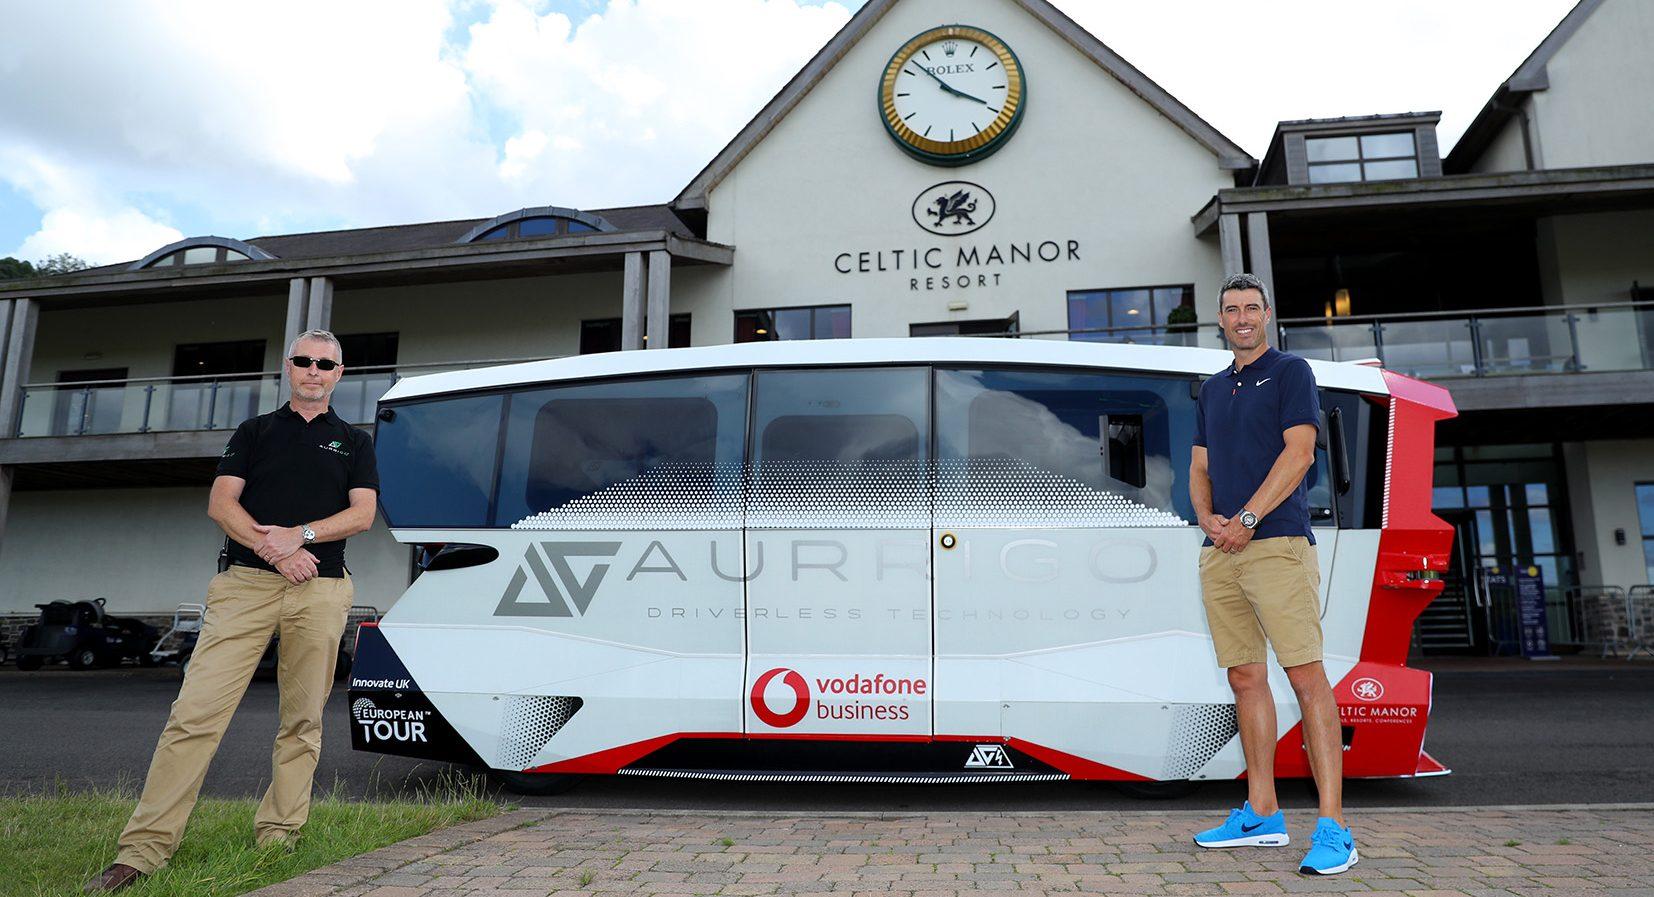 Aurrigo Autonomous Shuttle Celtic Manor - (L to R) Miles Garner (Aurrigo) with professional golfer Ross Fisher.